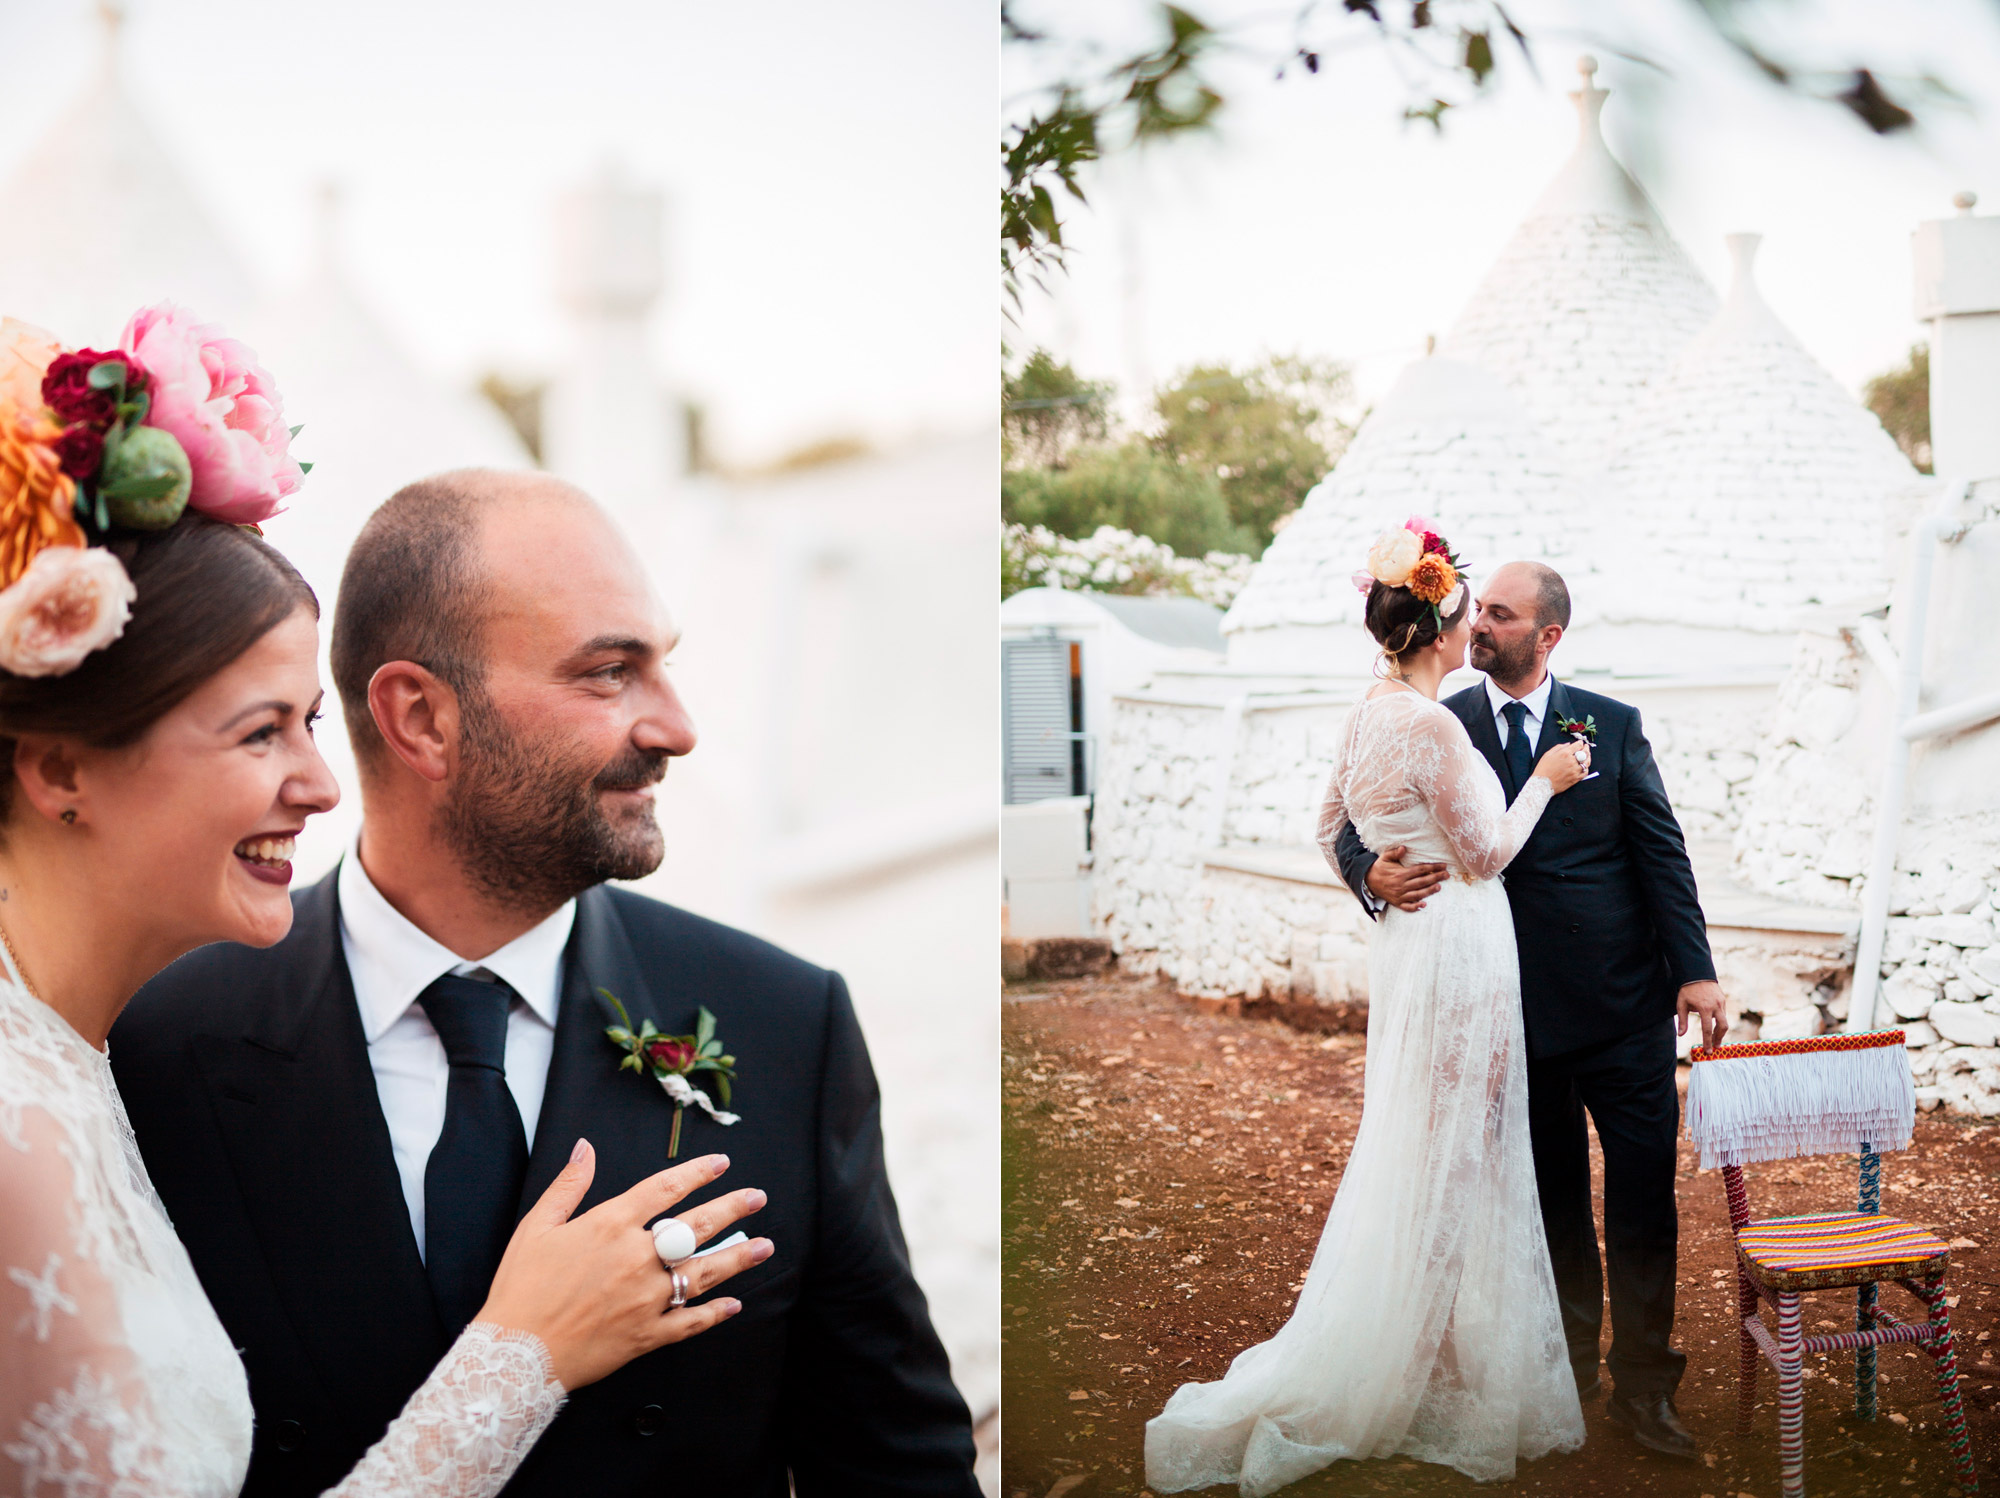 215-FIKUS-PUGLIA-wedding-ostuni-masseria.jpg